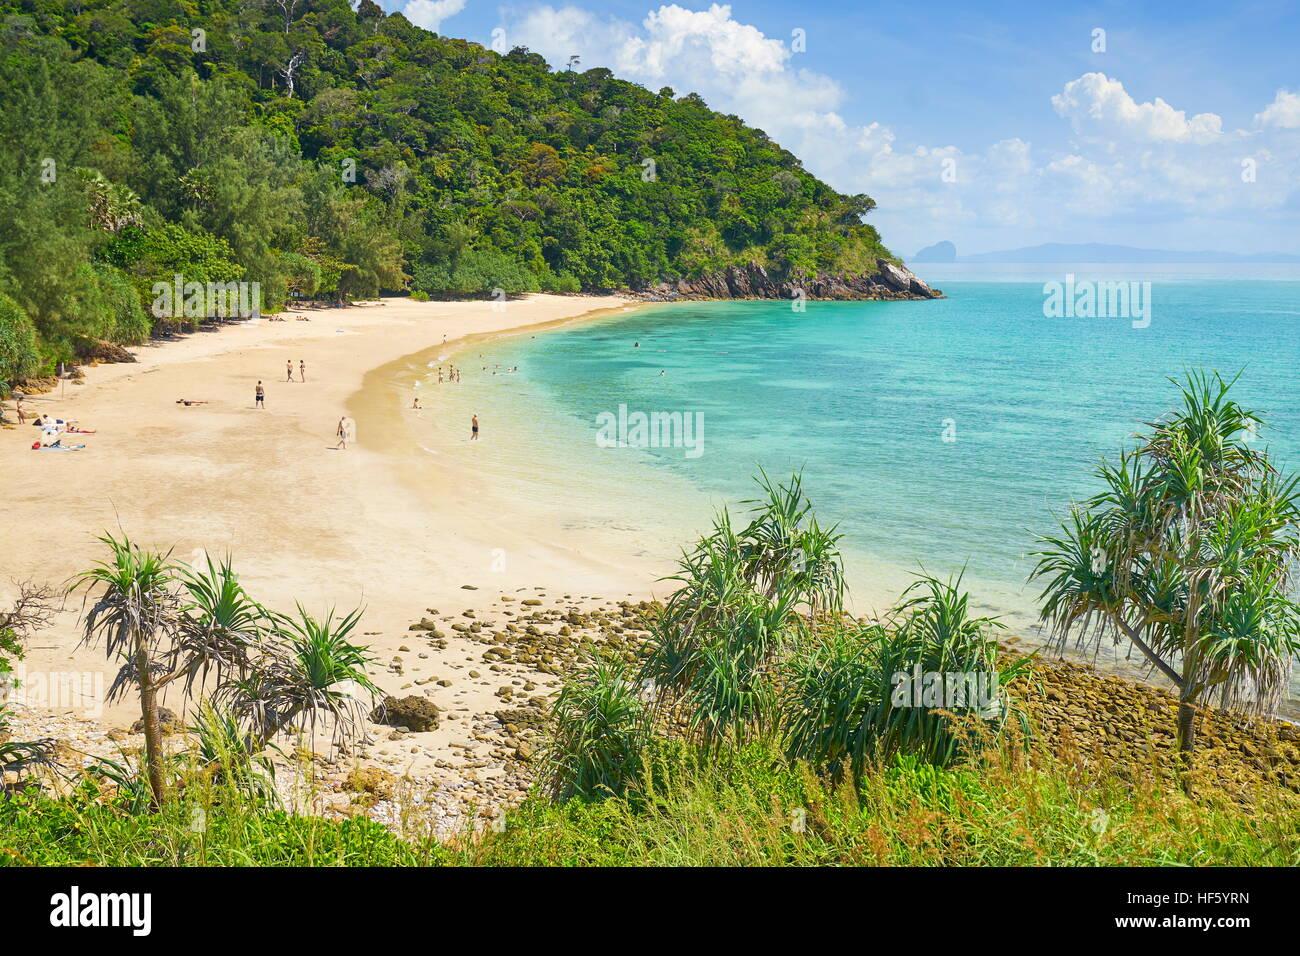 Beach at Ko Lanta National Park, Thailand - Stock Image